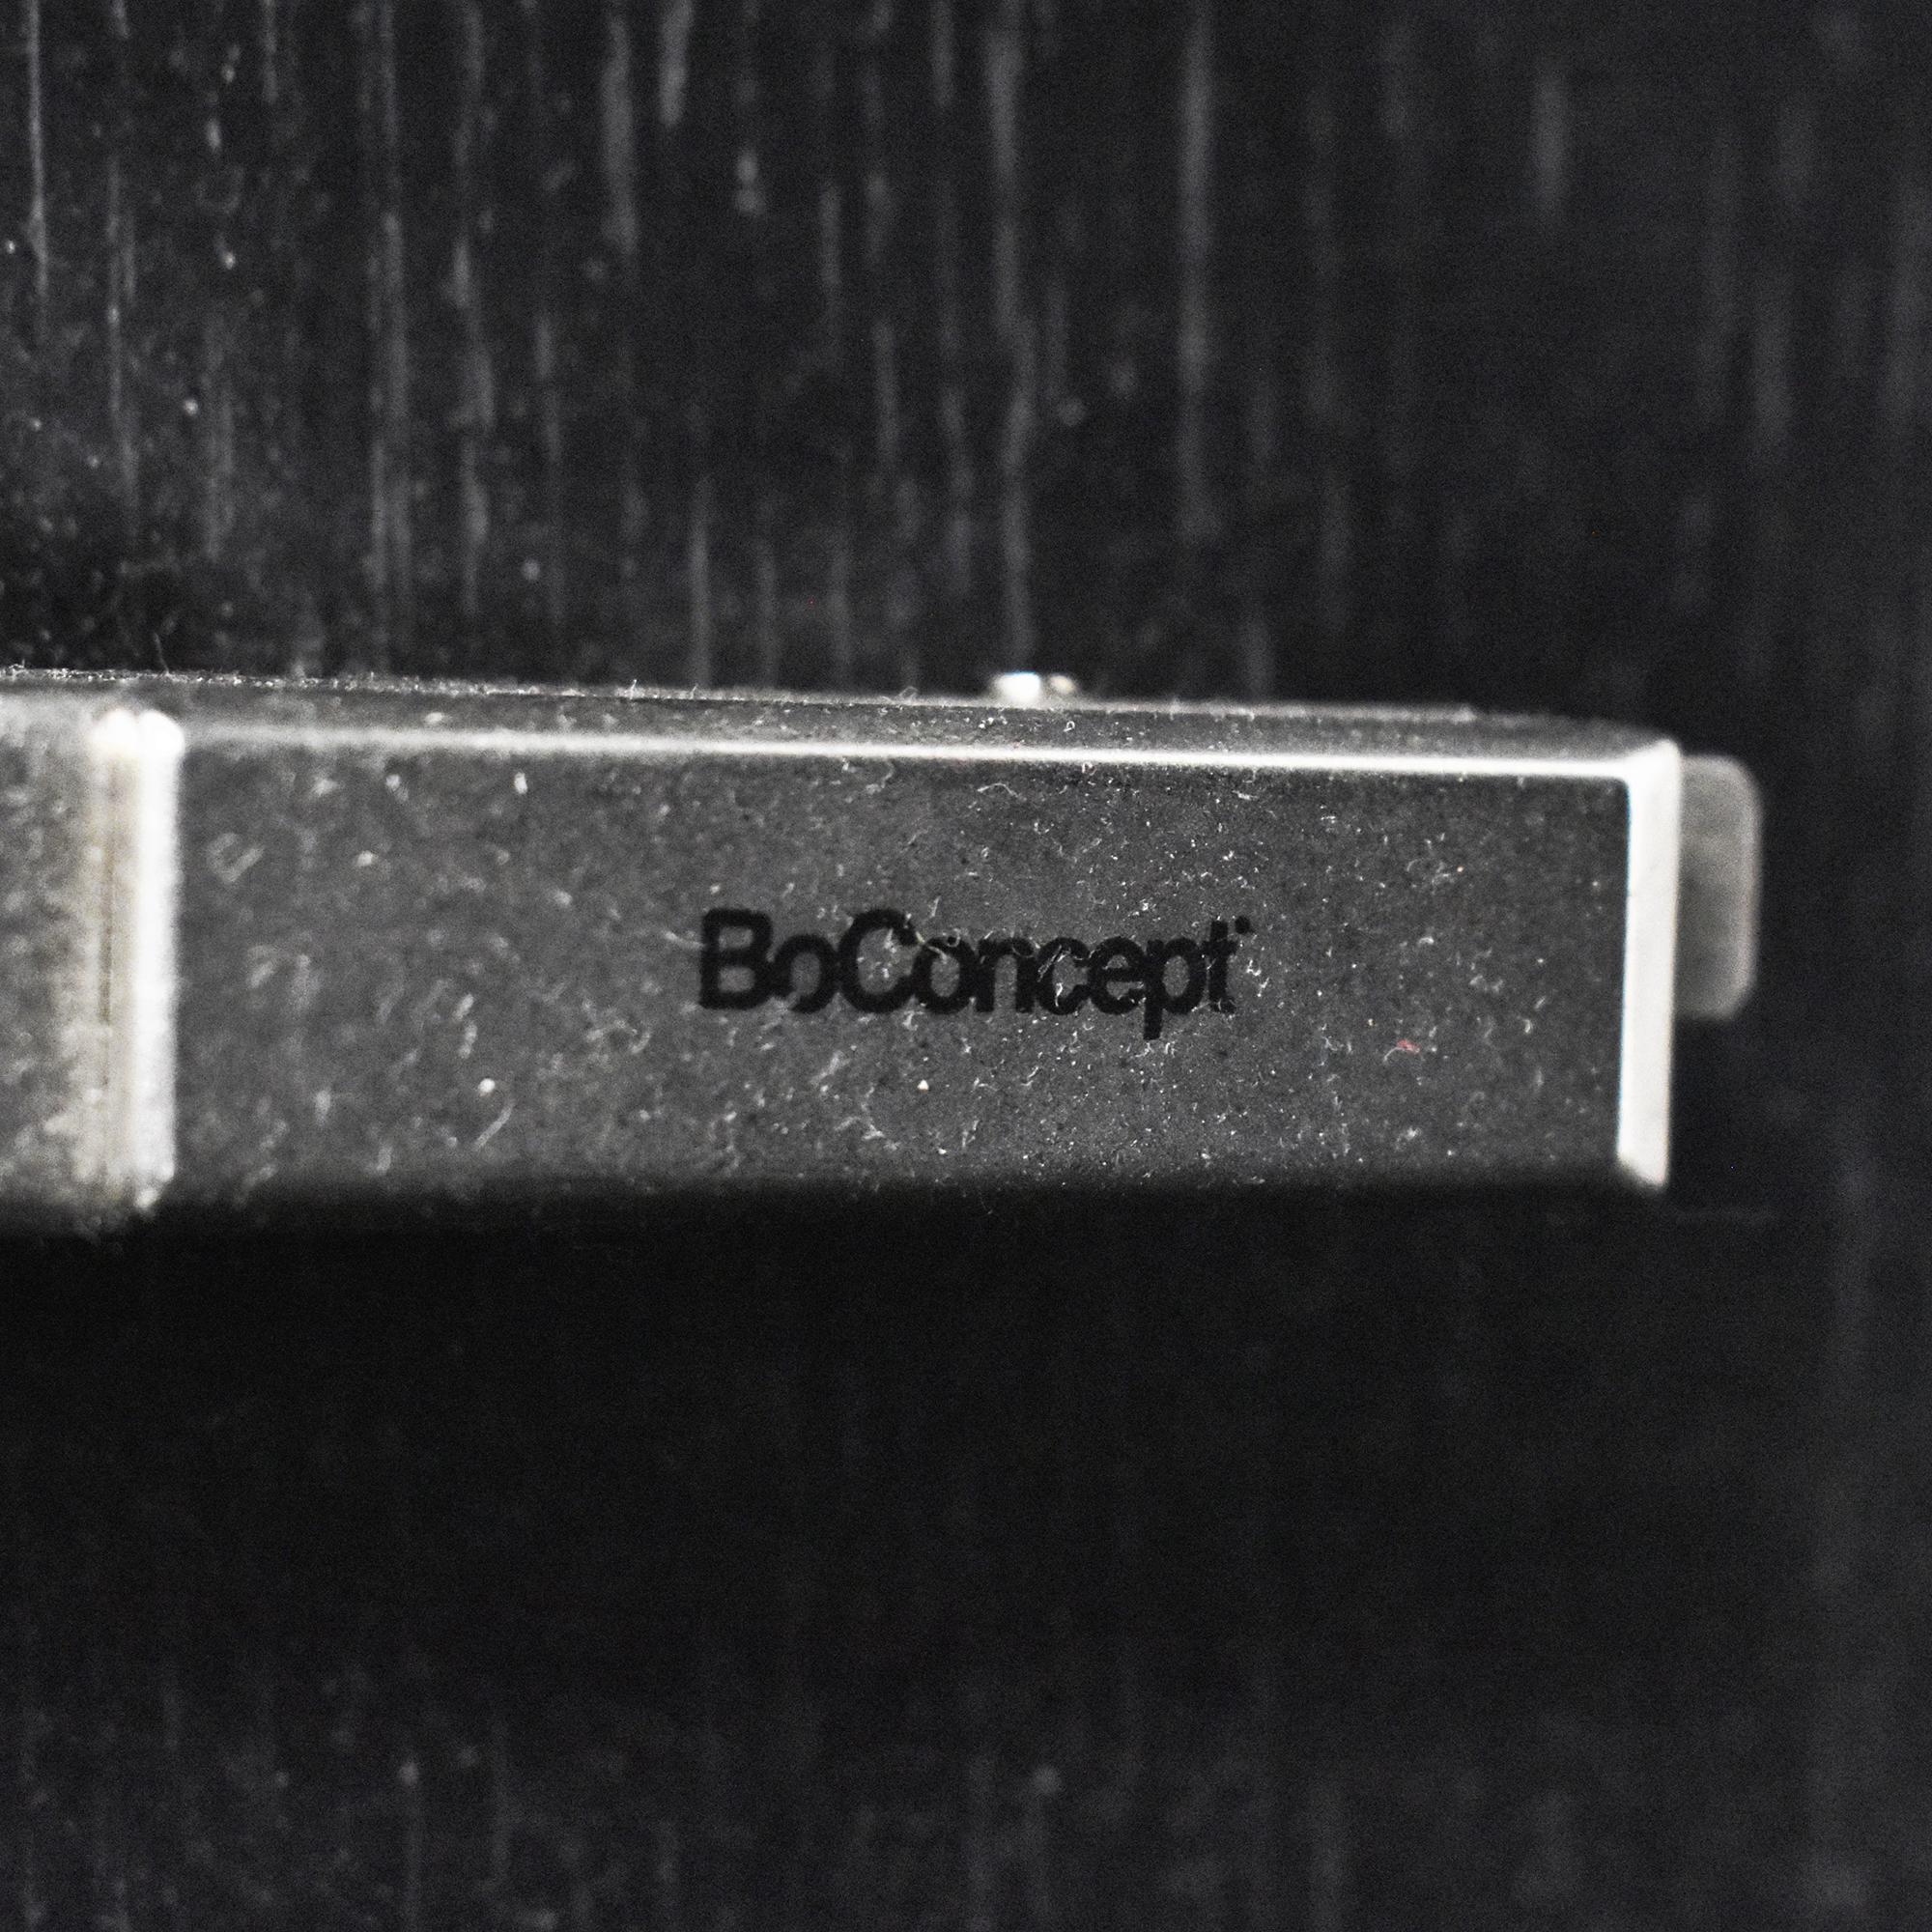 BoConcept Low Media Console / Storage